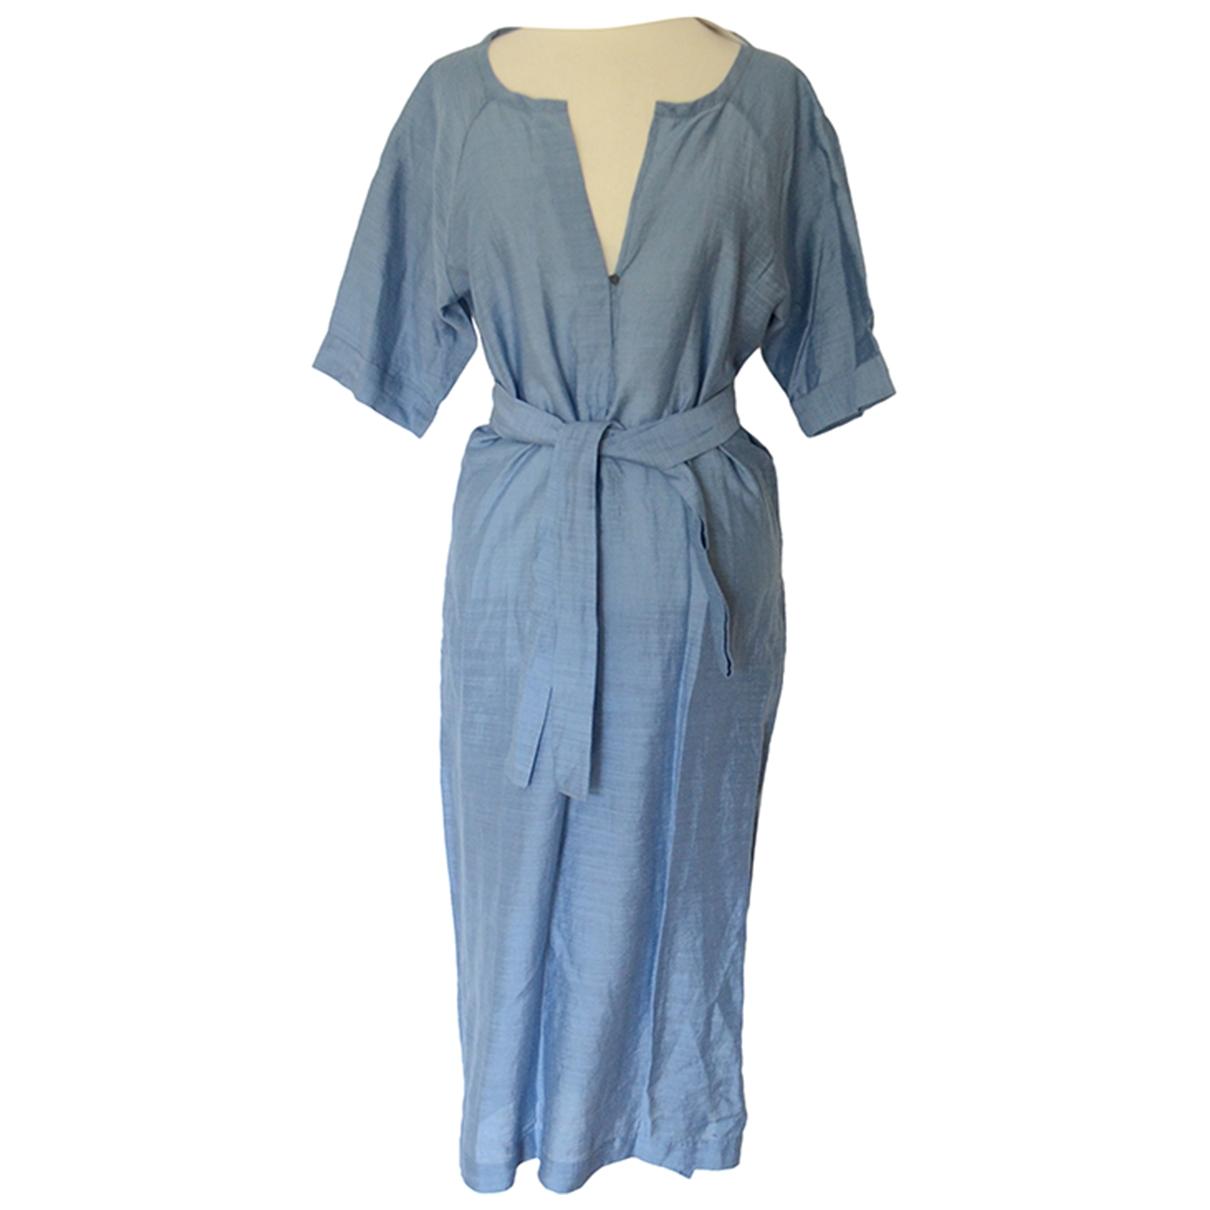 Humanoid \N Blue dress for Women M International